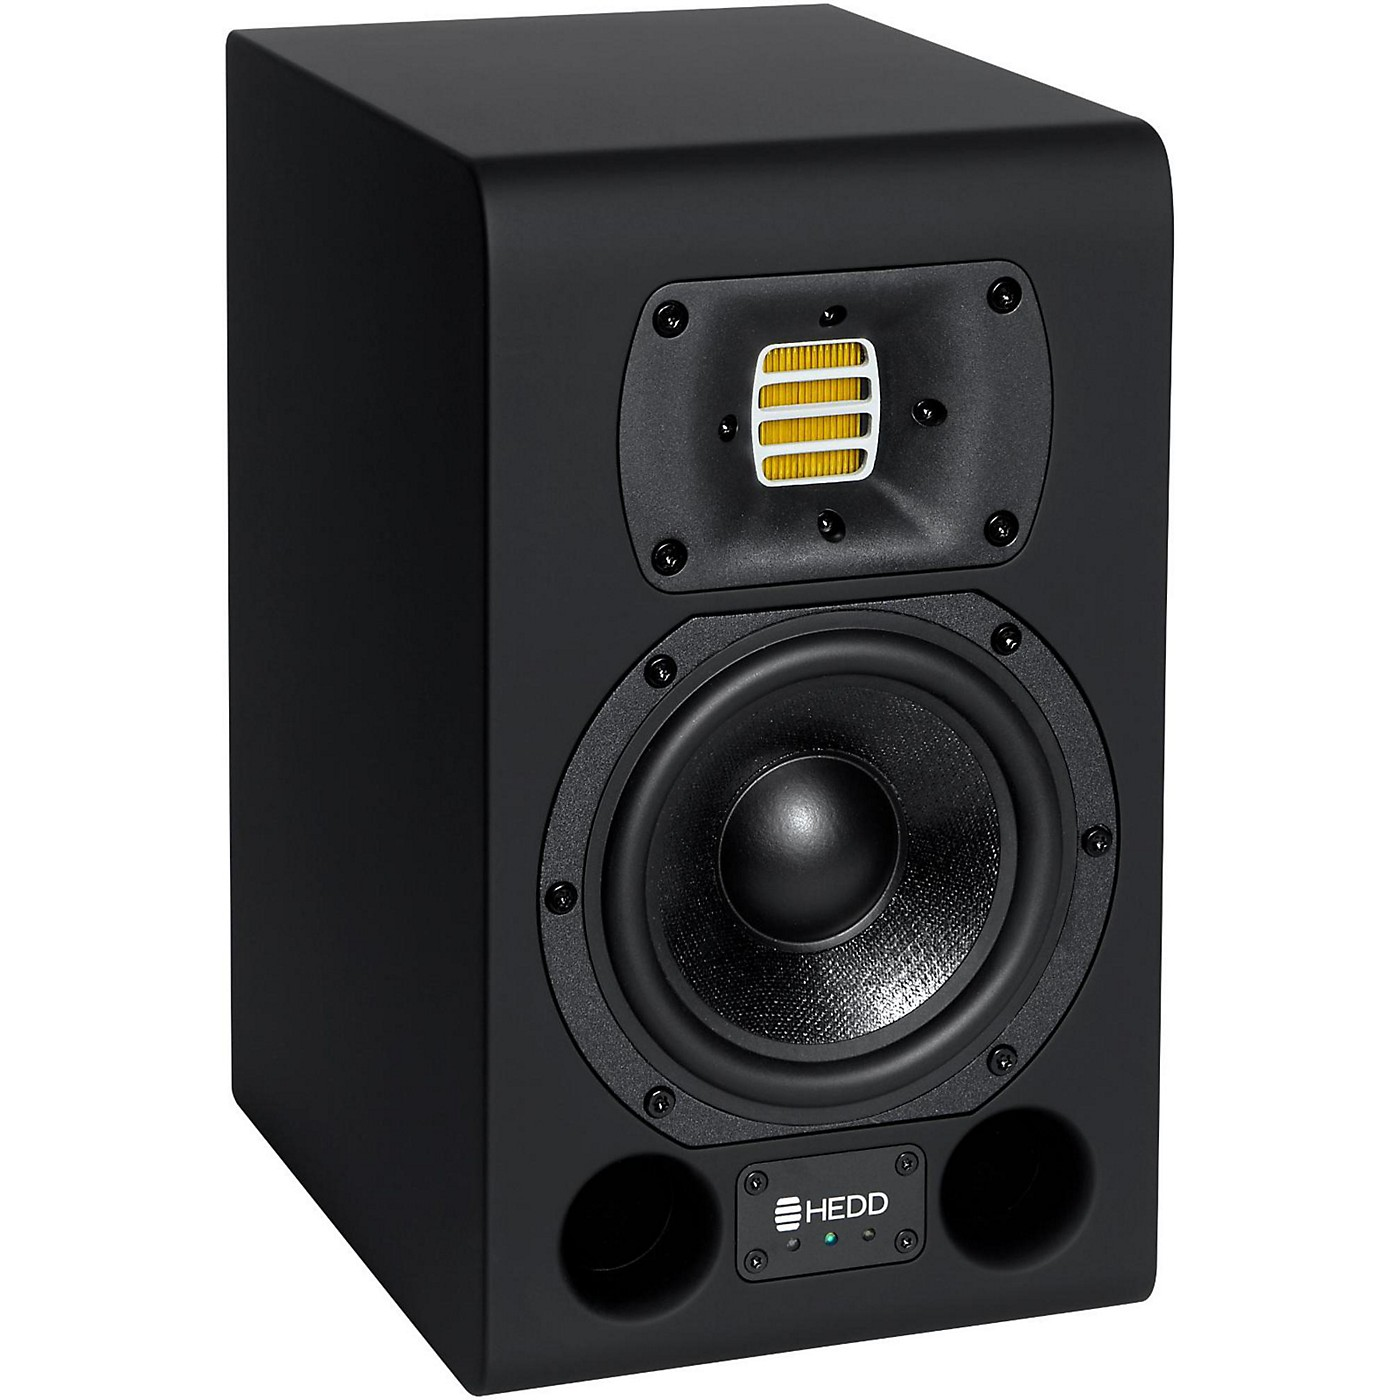 HEDD Type 05 Studio Monitor, 5 1/2